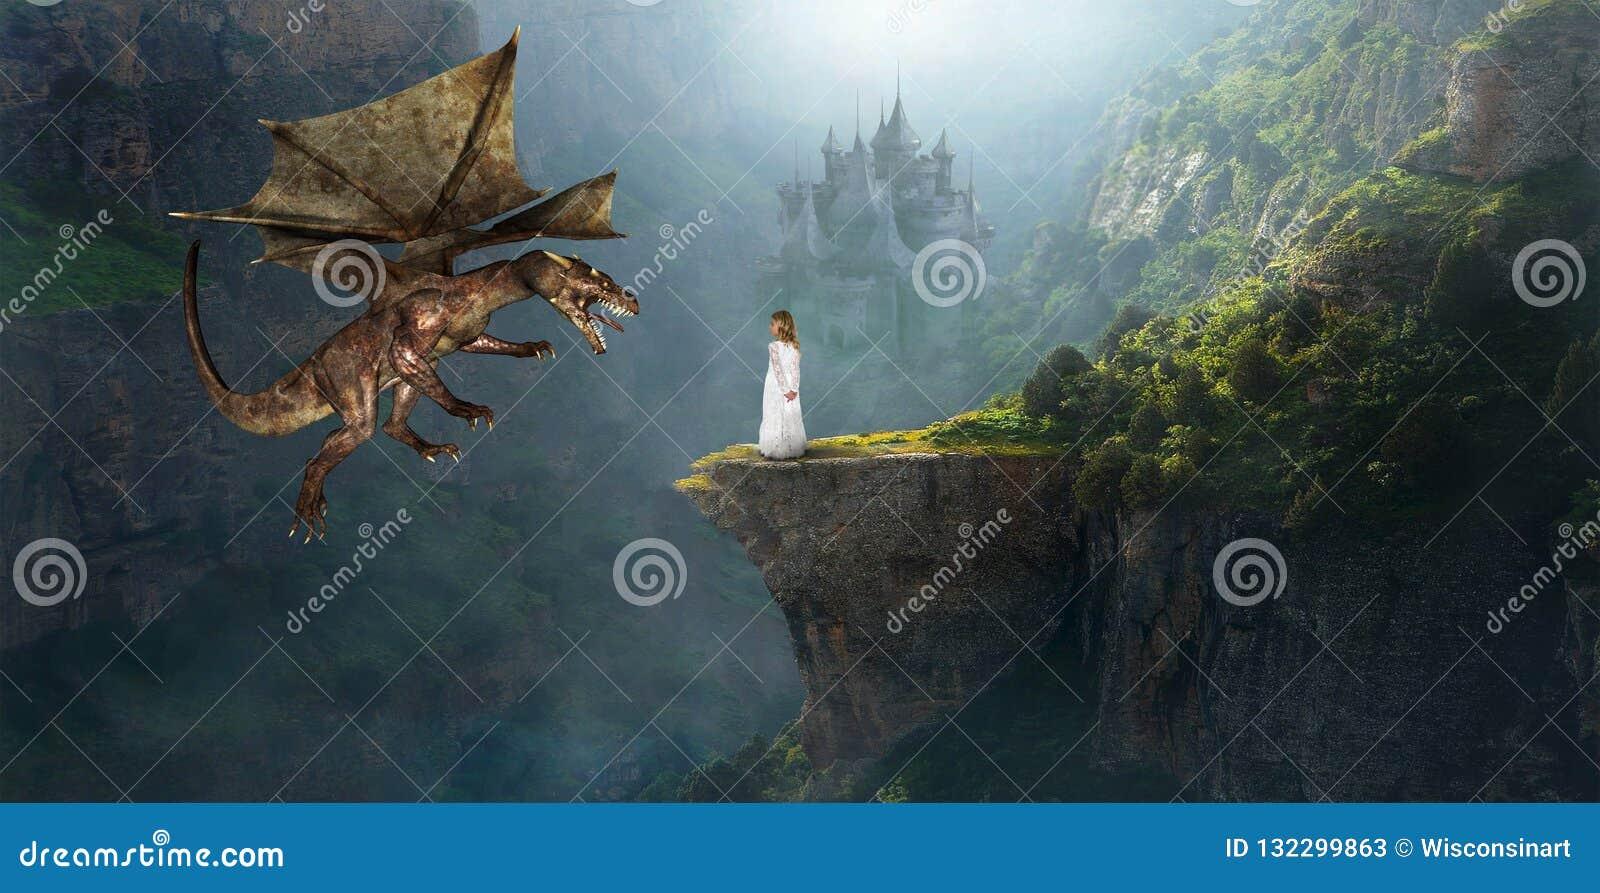 Fantasy Dragon, Castle, Girl, Imagination, Princess